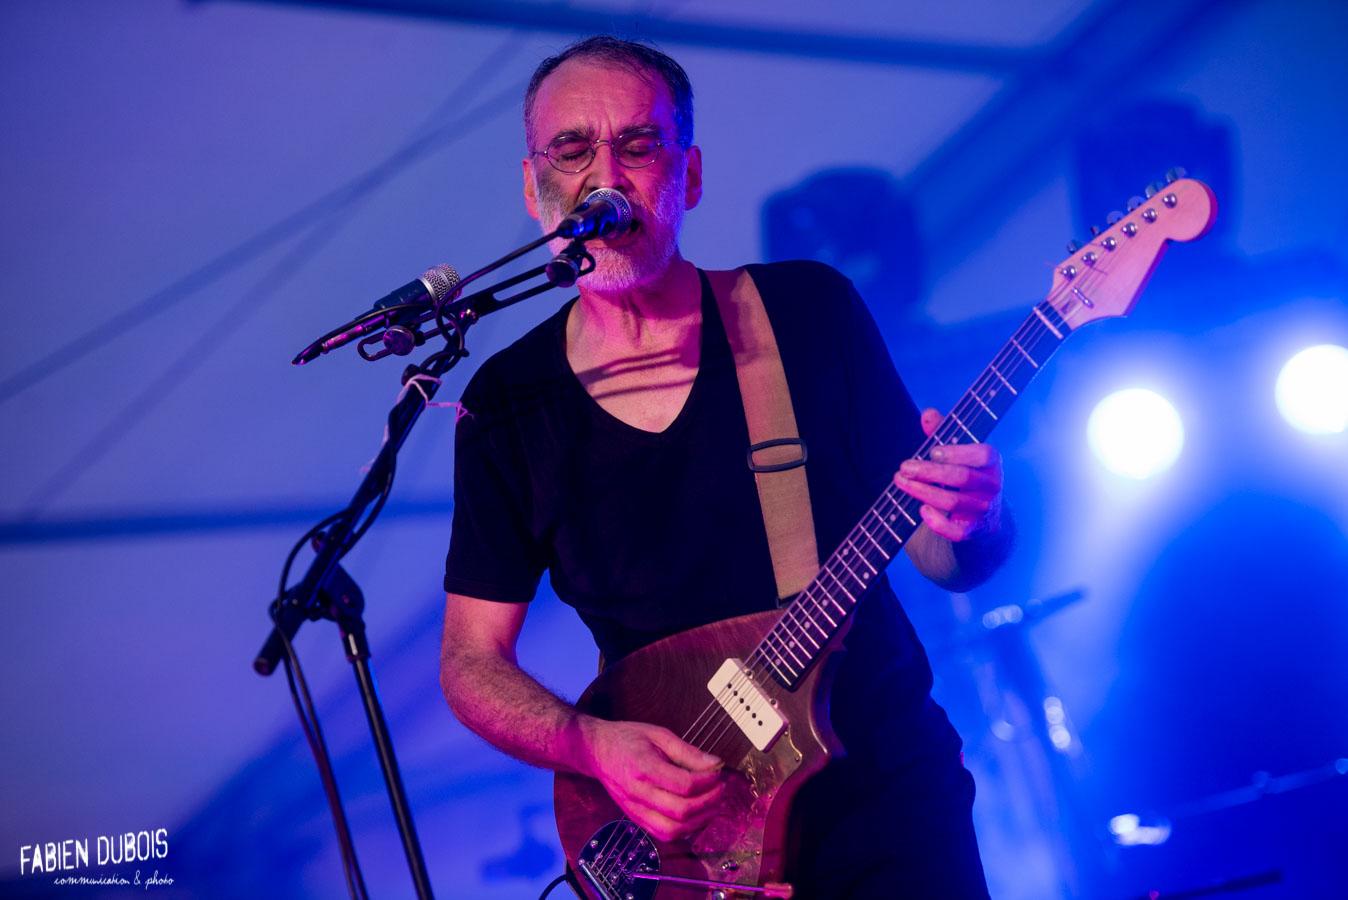 Photo Zato Europopcon Festival Mervans Vendredi  2018